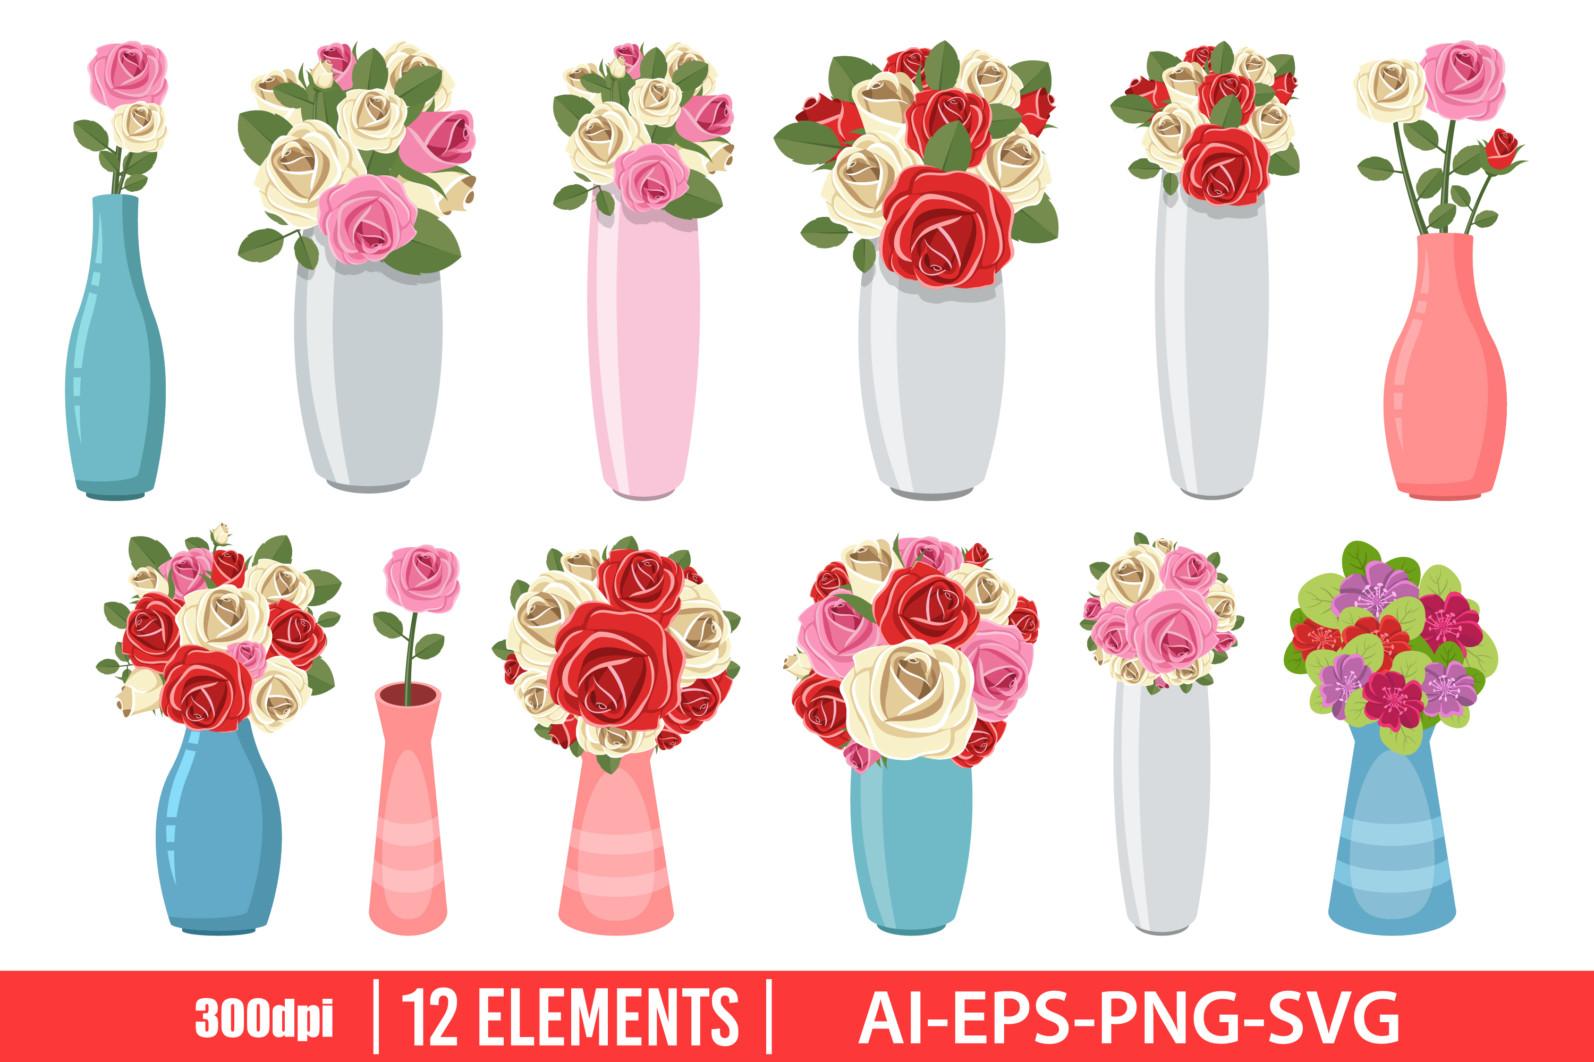 Vase with flower clipart vector design illustration. Flower vase set. Vector Clipart Print - FLOWER VASE scaled -